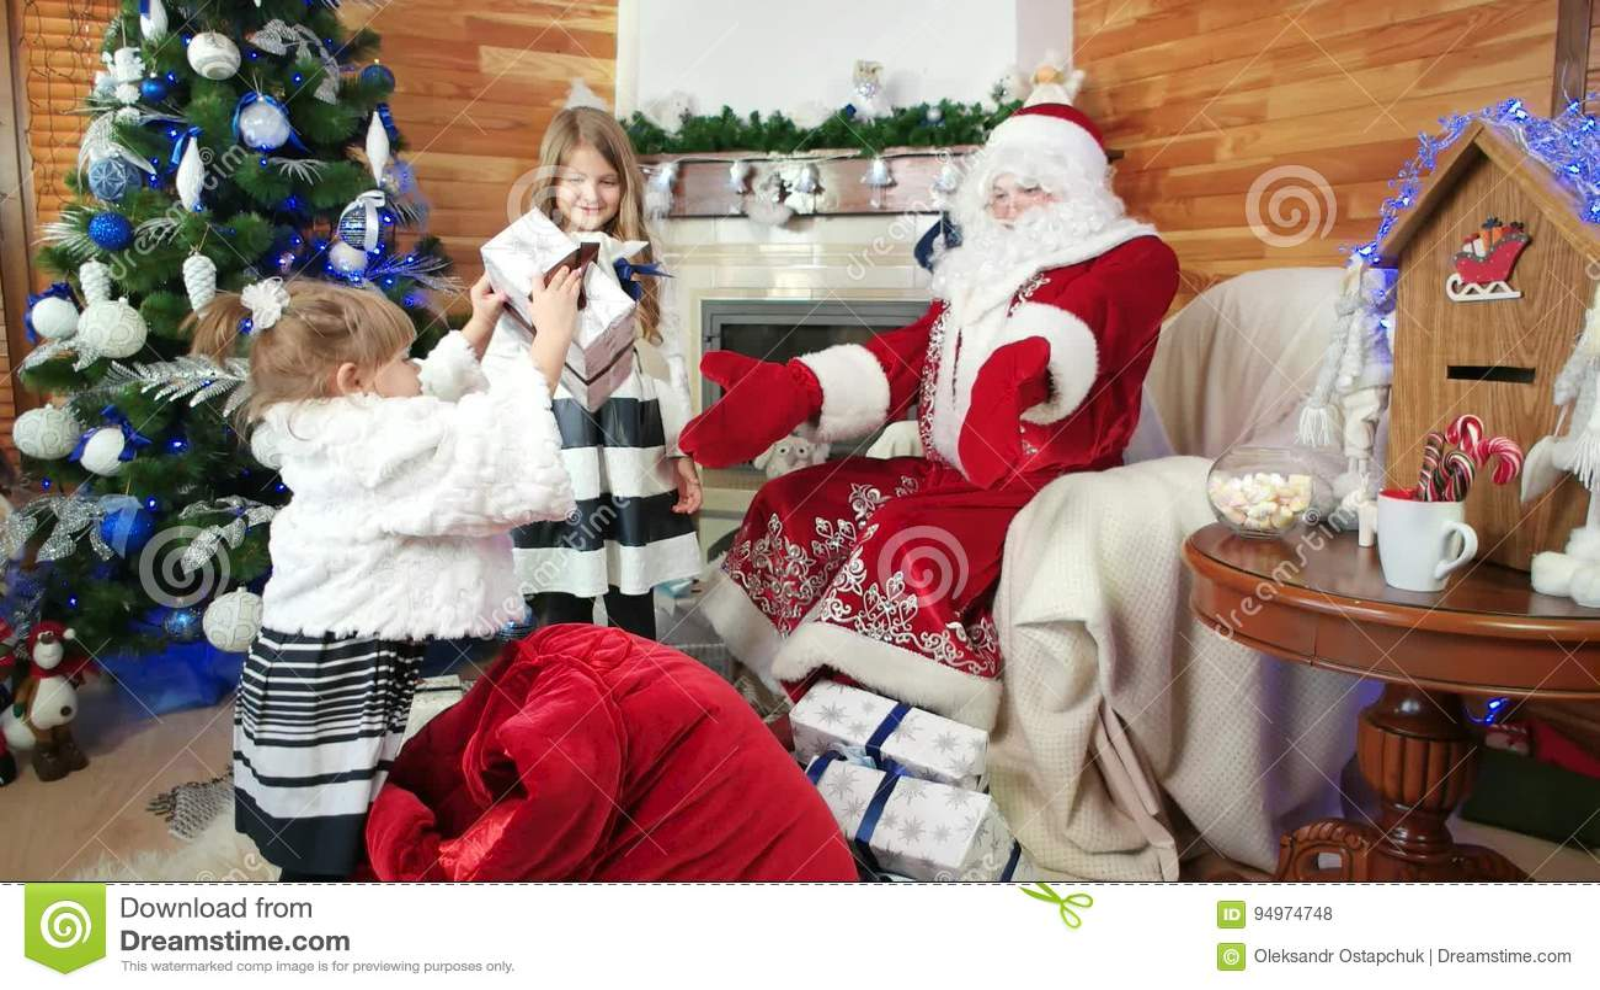 Little Girls Help Santa With Christmas Gifts, Saint Nicolas Winter ...